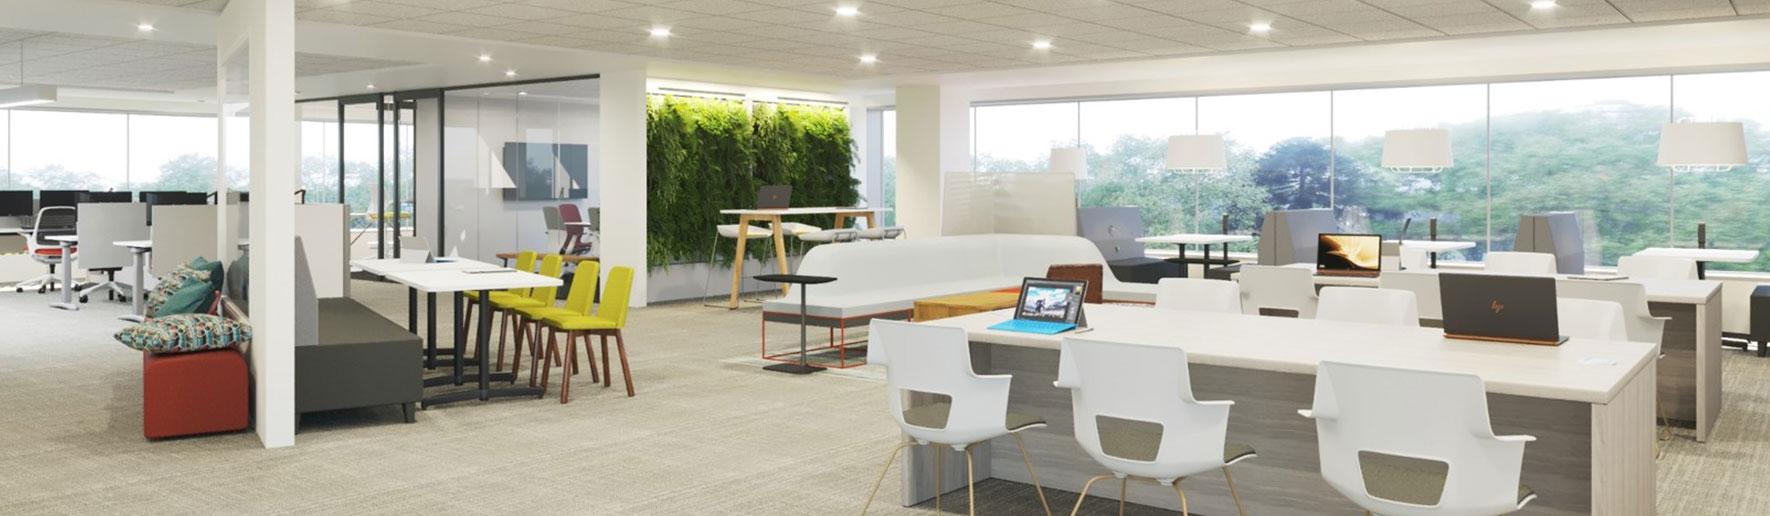 3D rendered work environment